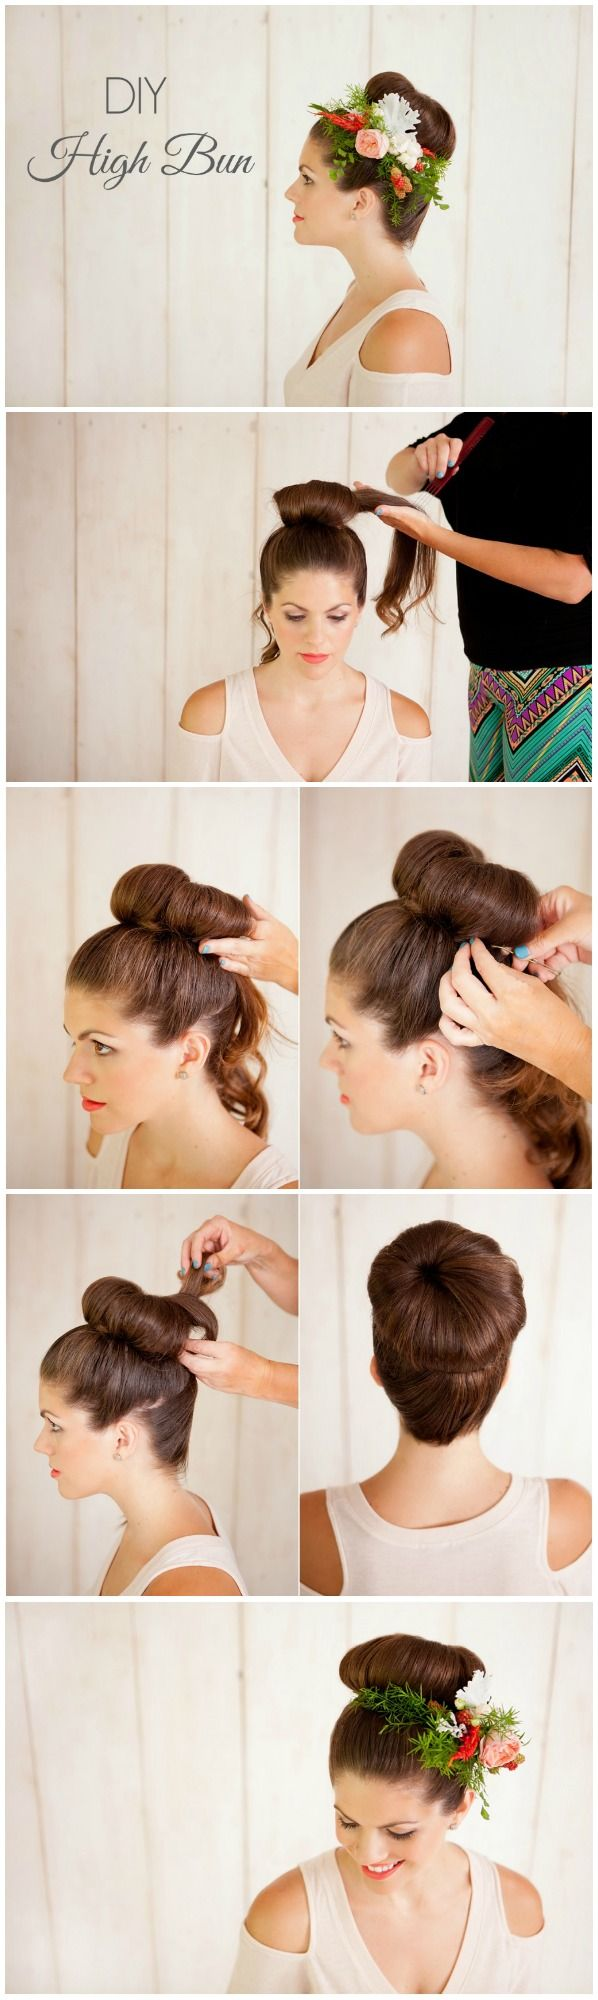 DIY high bun tutorial. I love the addition of the flower comb! by Danielle Evans Photography #weddinglooks #weddinghair